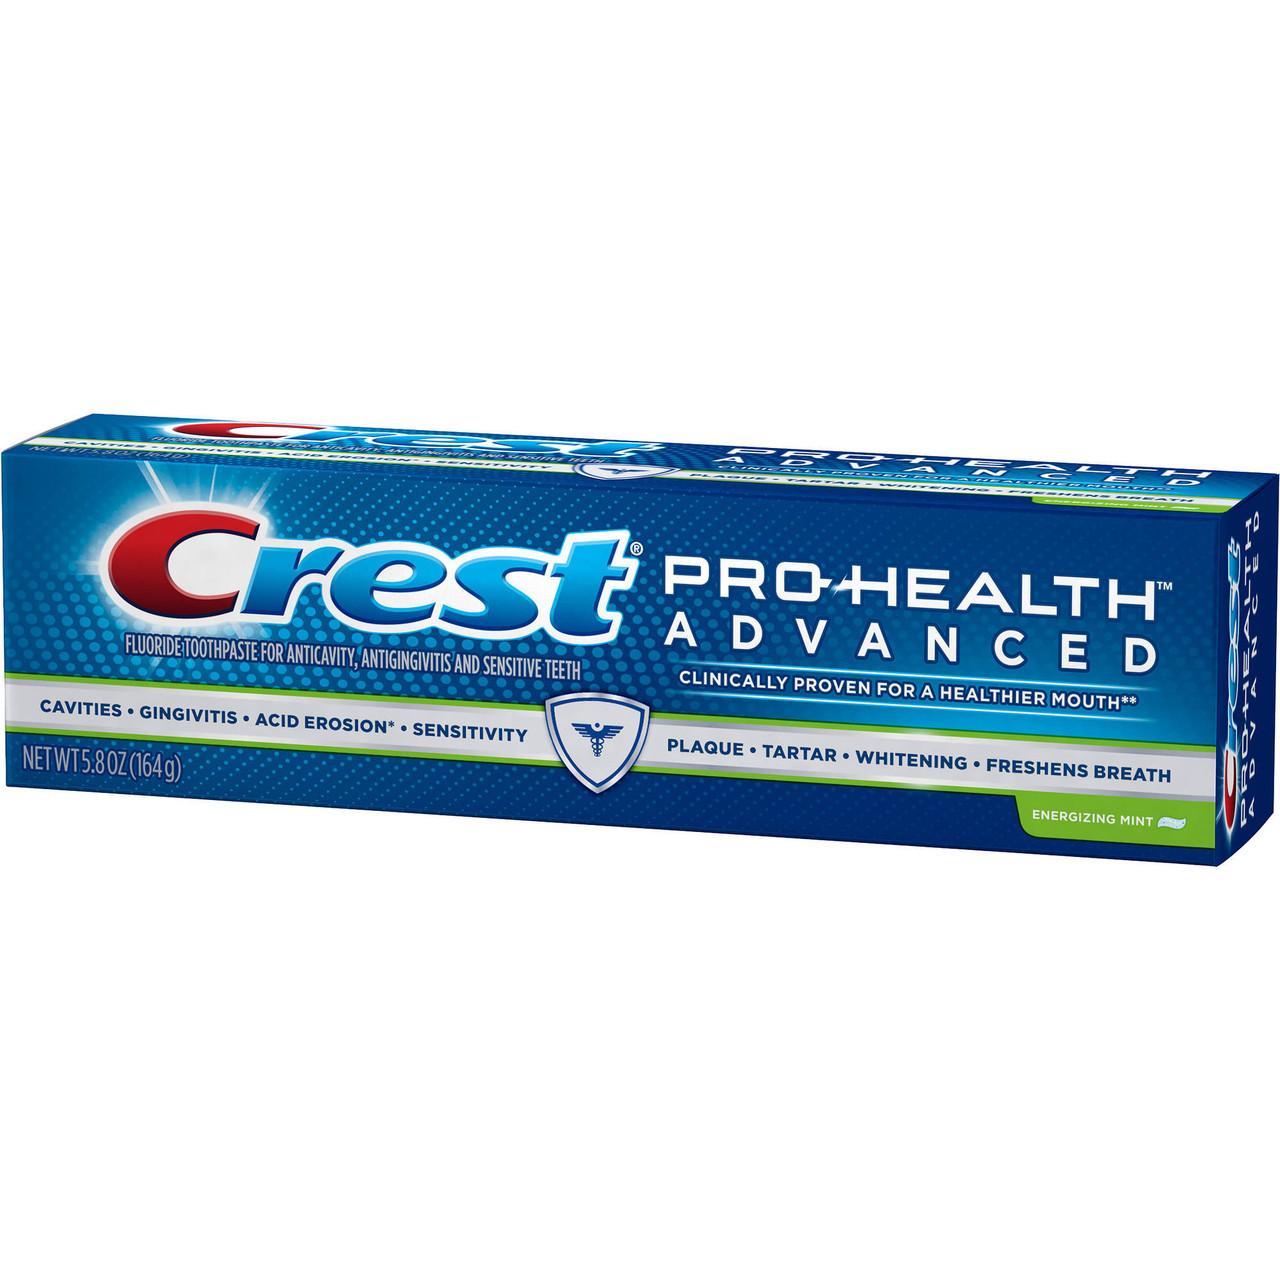 Crest Pro-Health Advanced Energizing Mint - Зубная паста, 164 г